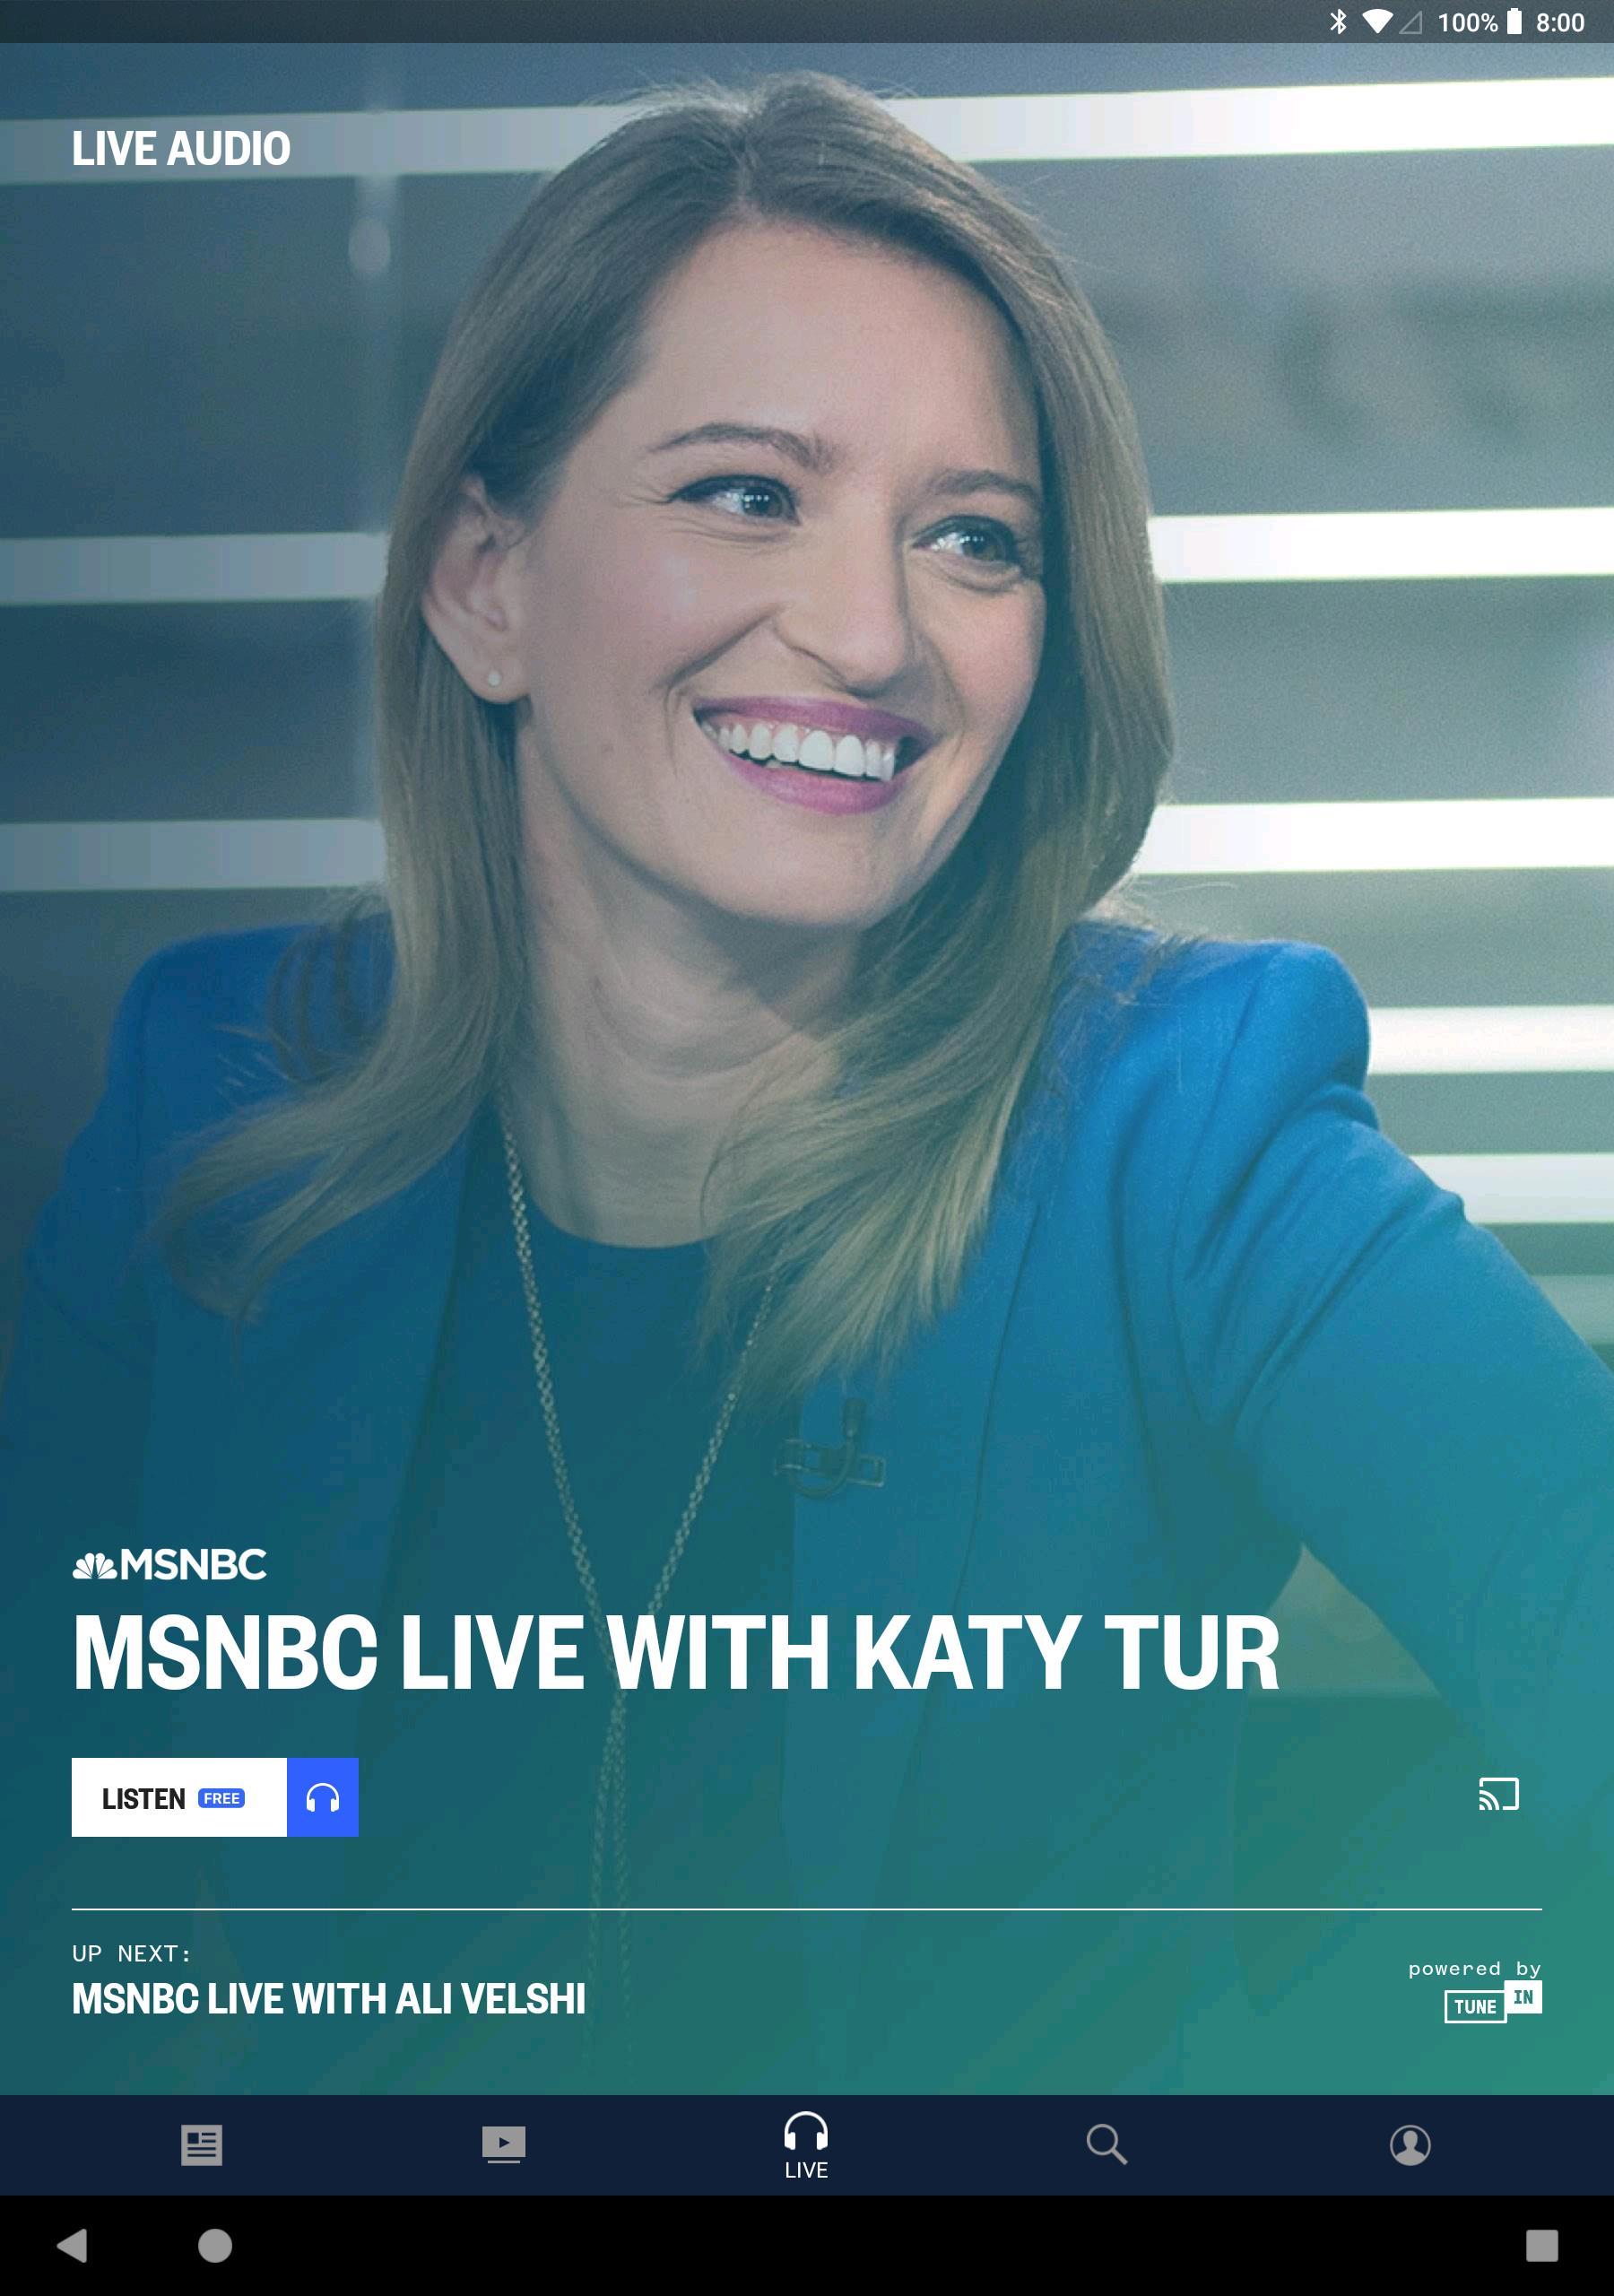 NBC News: Breaking News, US News & Live Video 6.0.11 Screenshot 9